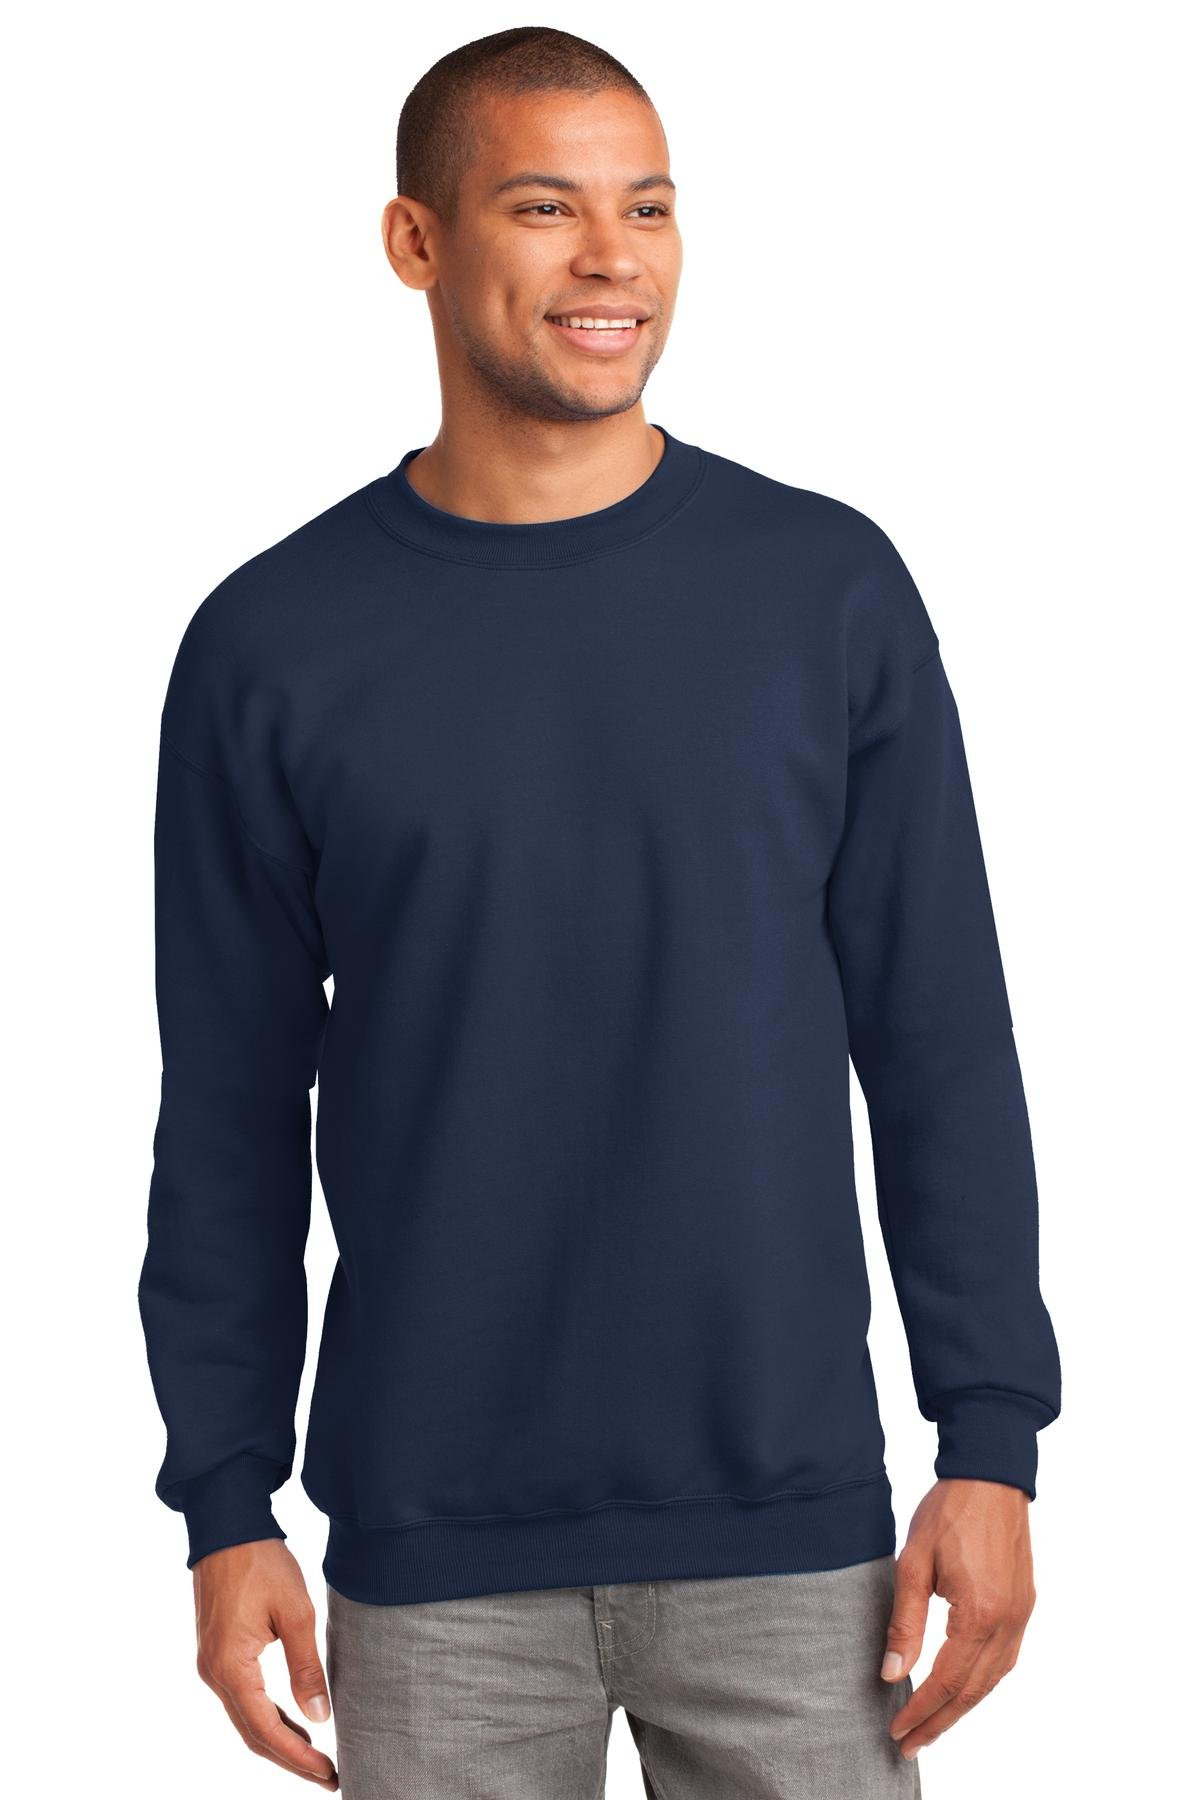 Port & Company Mens Tall Ultimate Crewneck Sweatshirt, Navy, XX-Large Tall